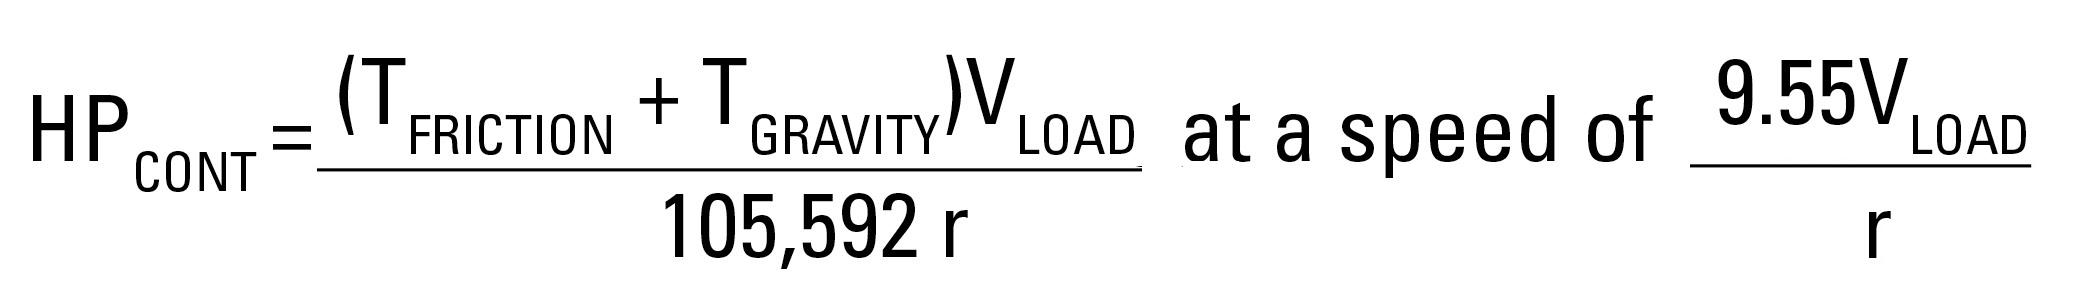 Bodine-gearmotors-for conveyors_formula-HP_11-12-2013